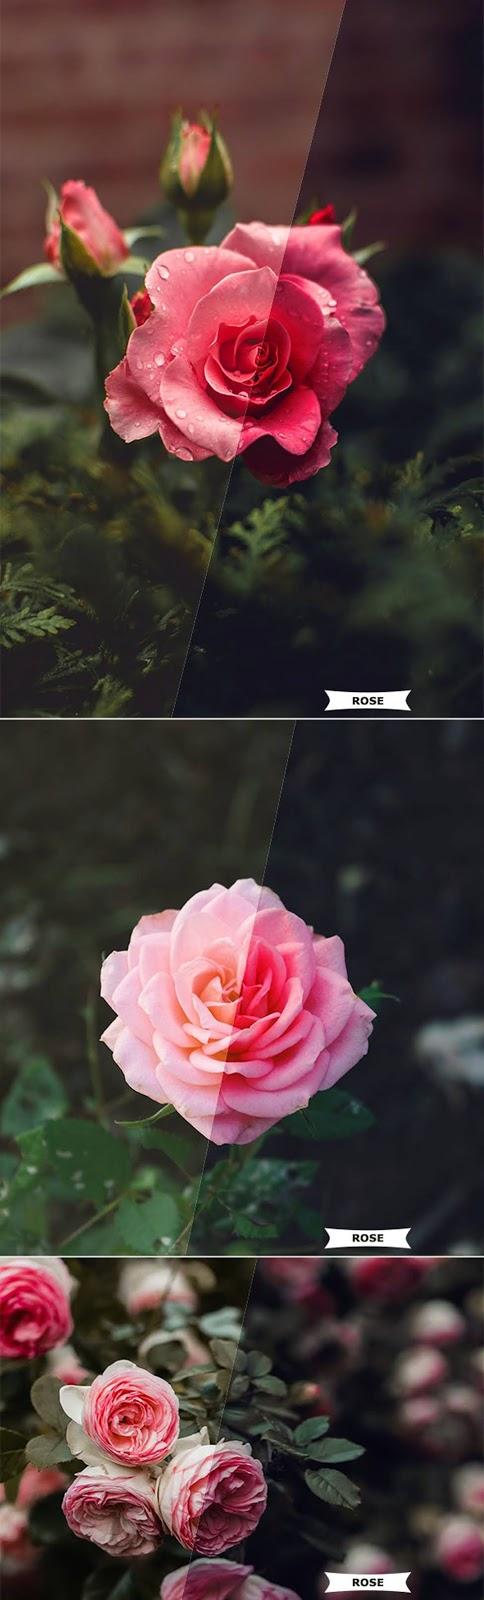 Rose Photoshop Action 26797254